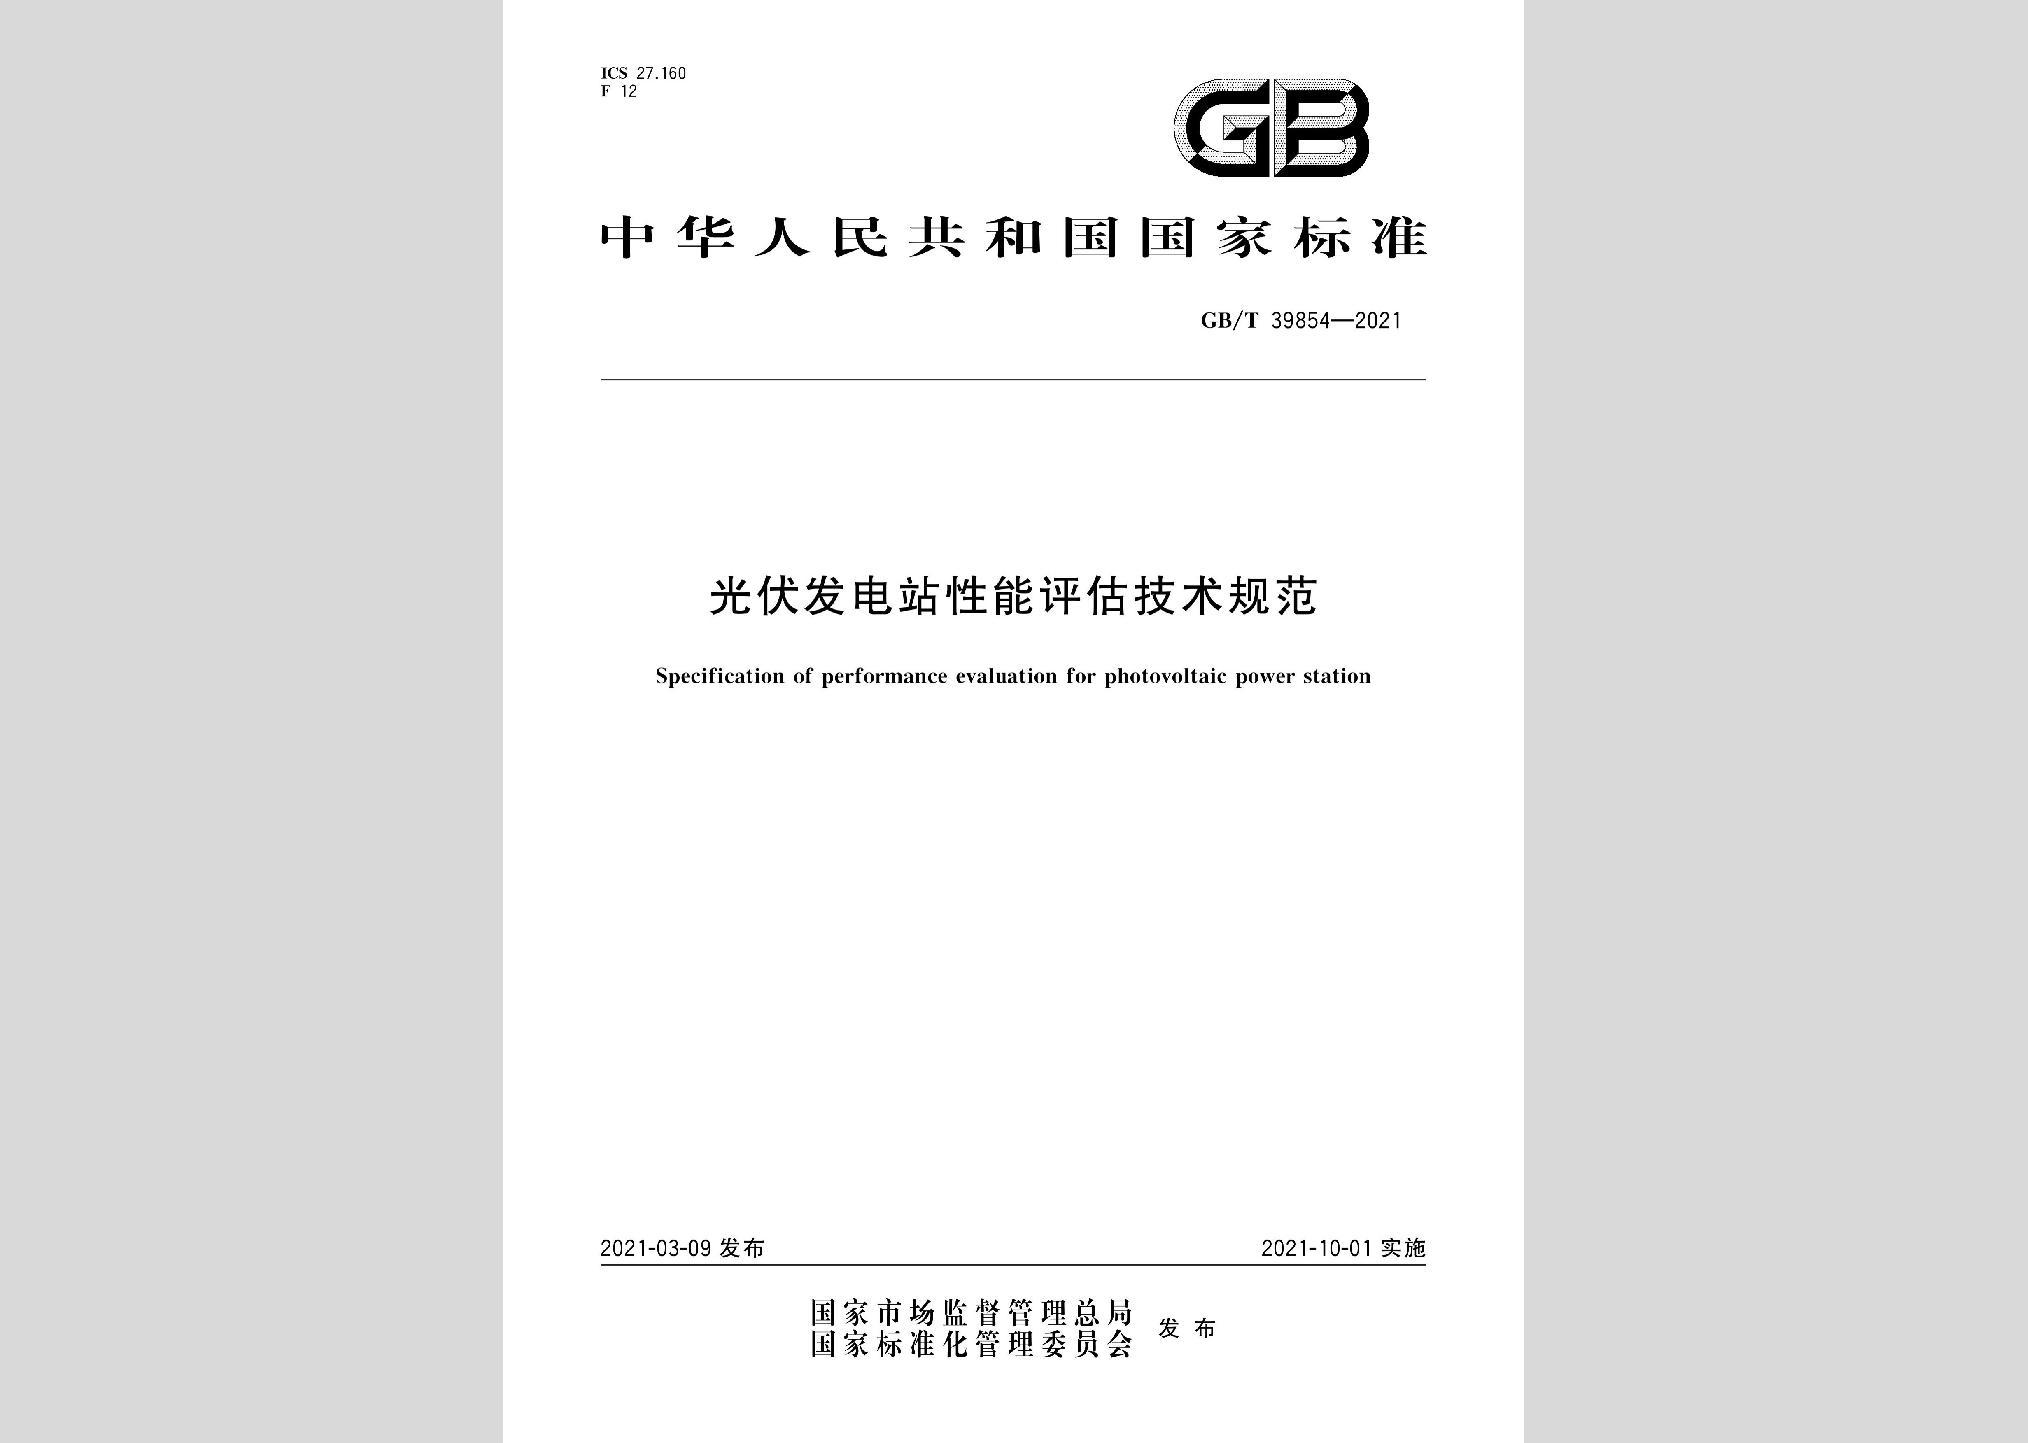 GB/T39854-2021:光伏发电站性能评估技术规范